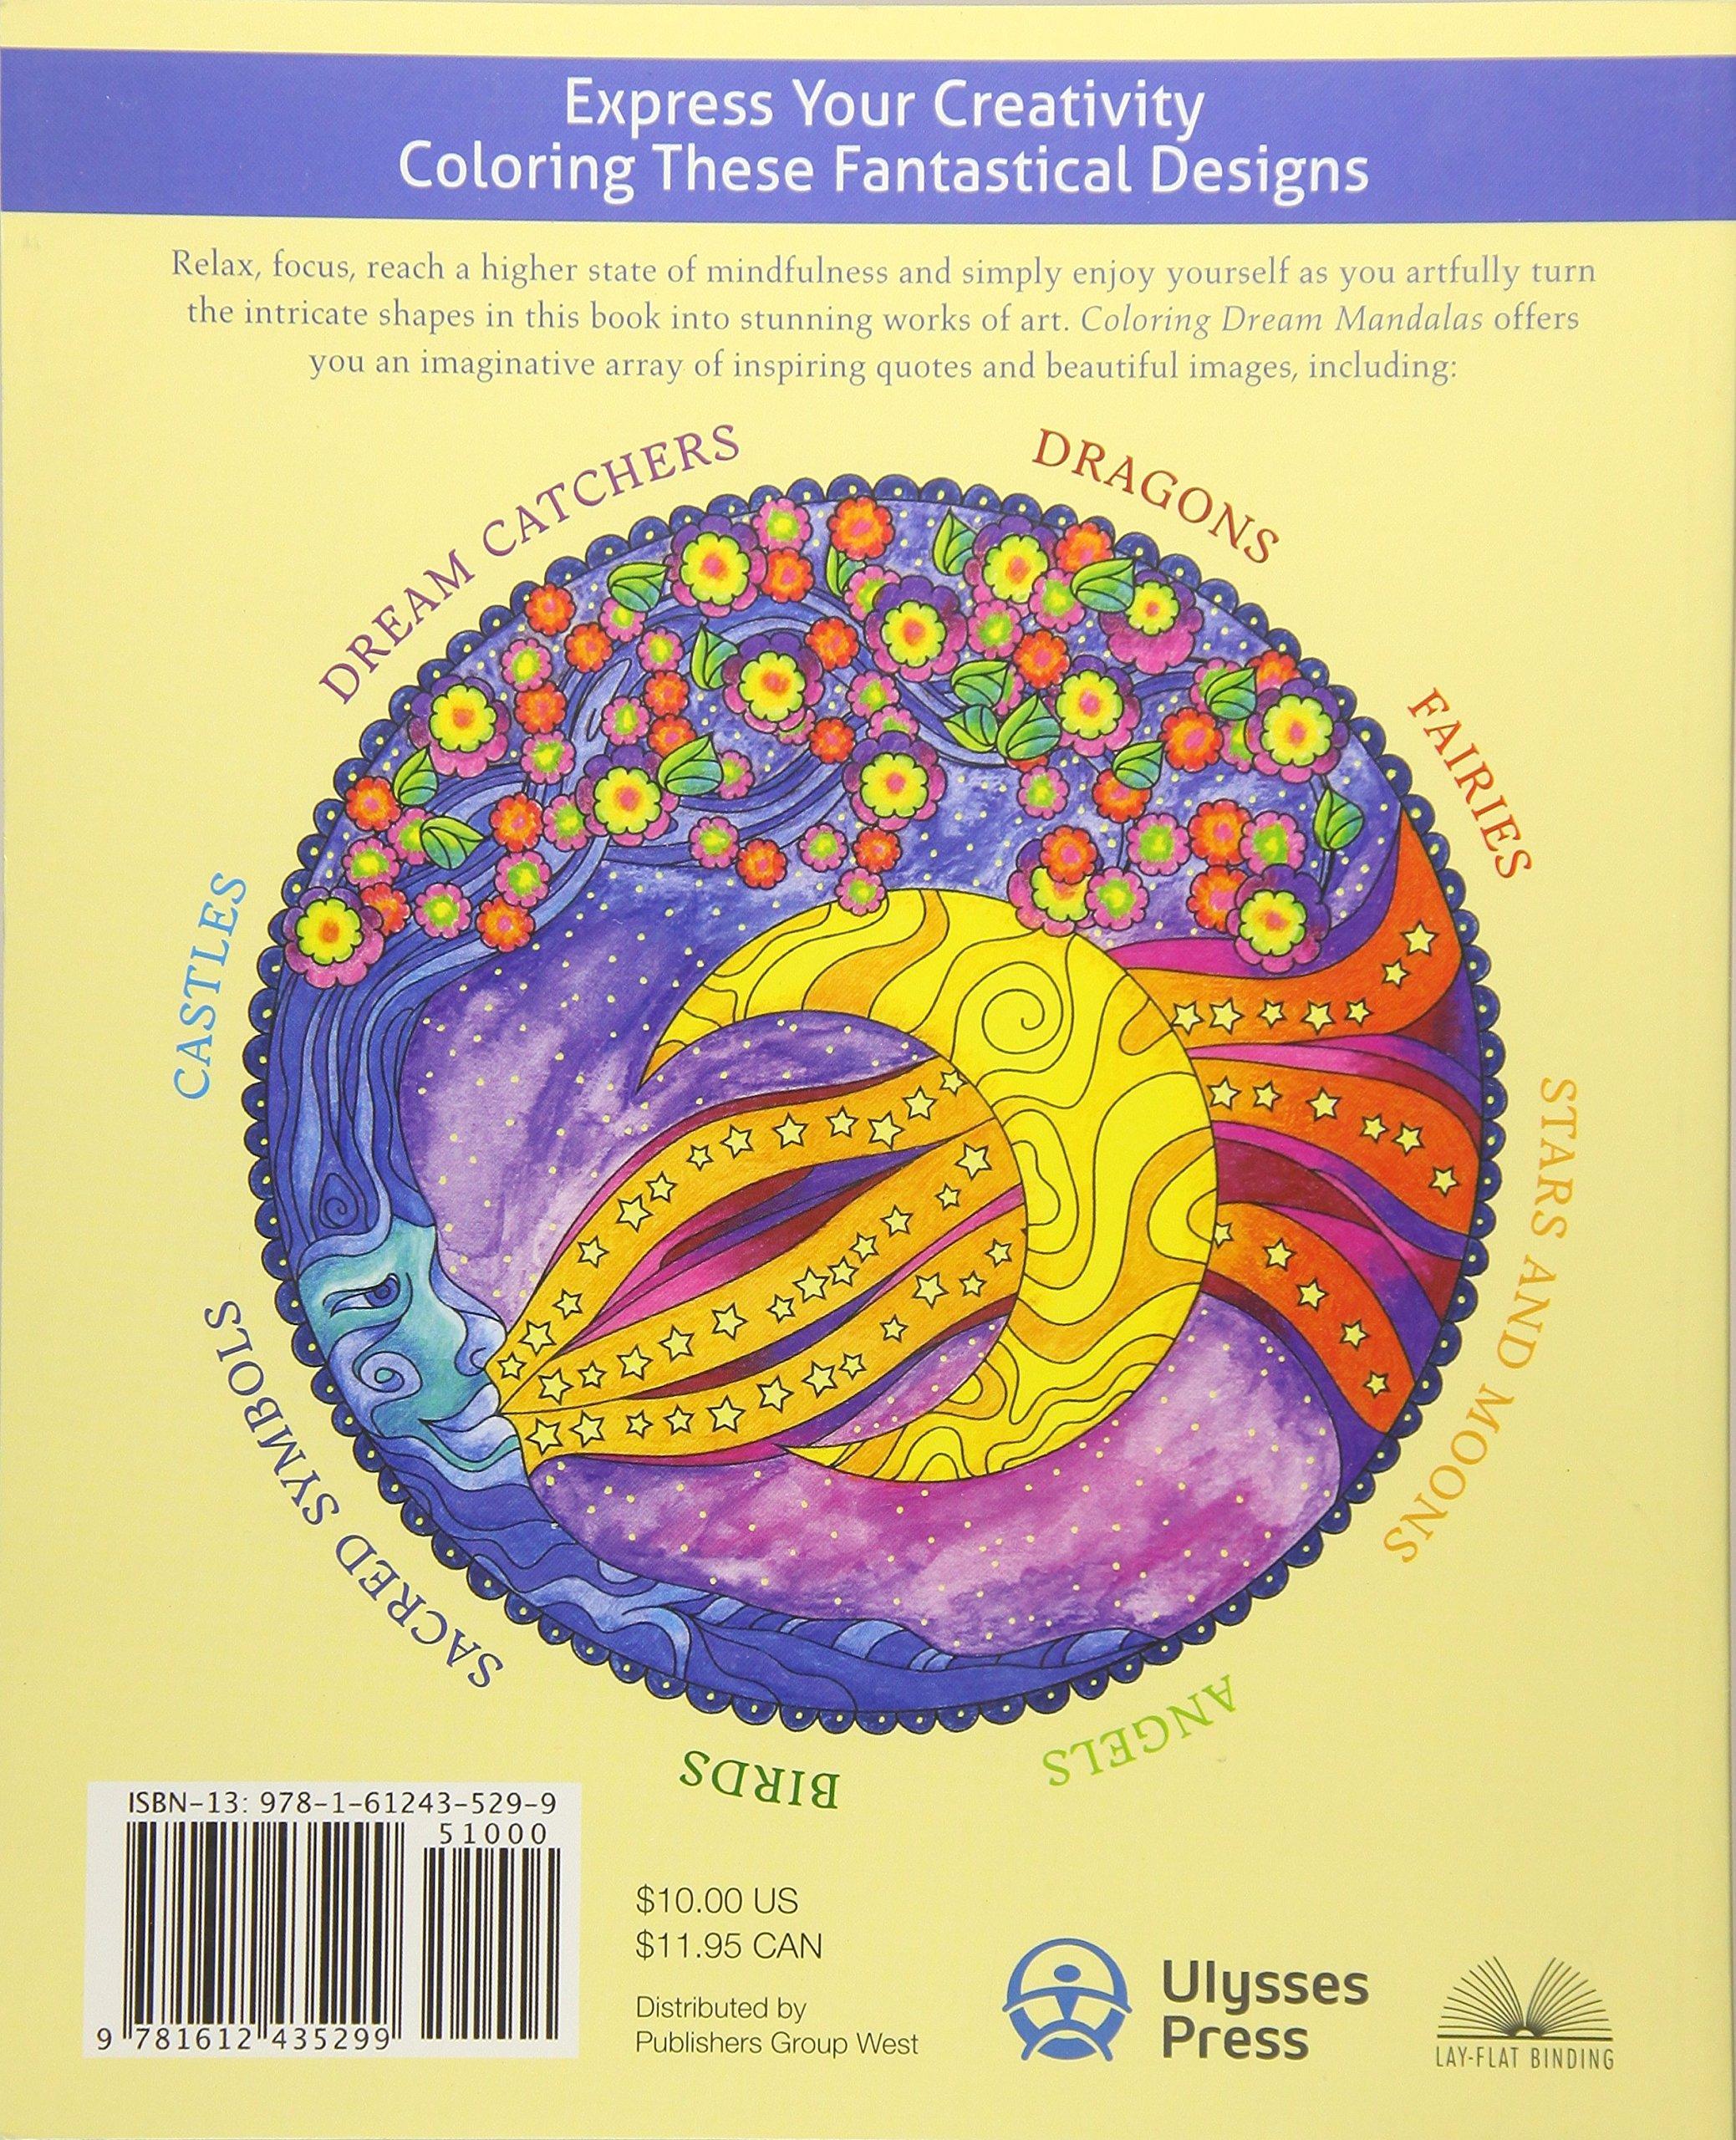 Coloring Dream Mandalas 30 Hand Drawn Designs For Mindful